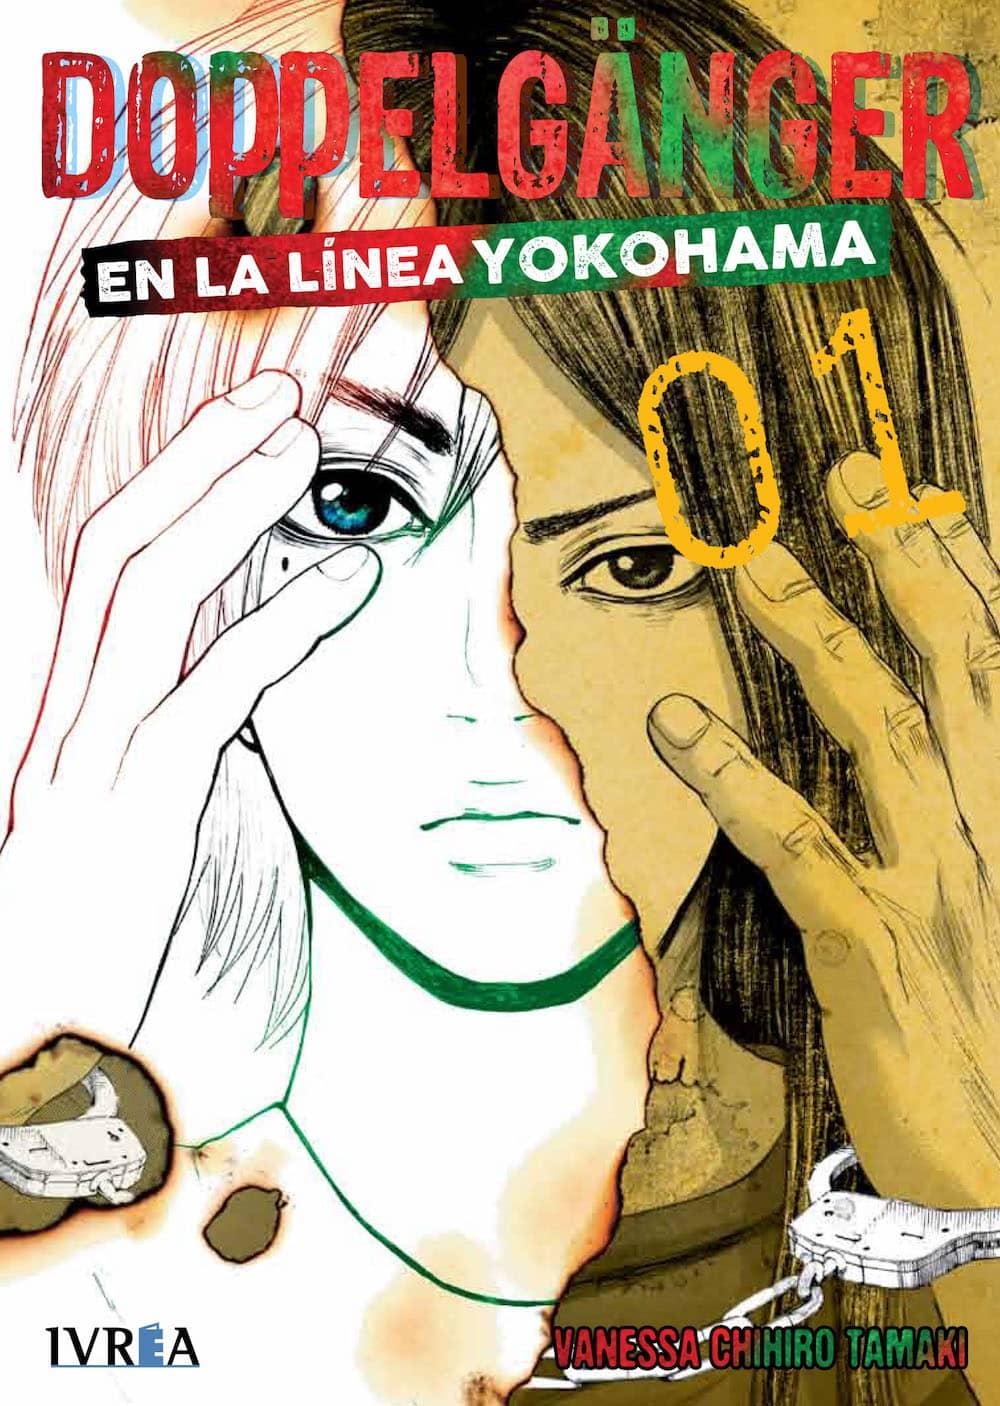 DOPPLEANGER EN LA LINEA DE YOKOHAMA